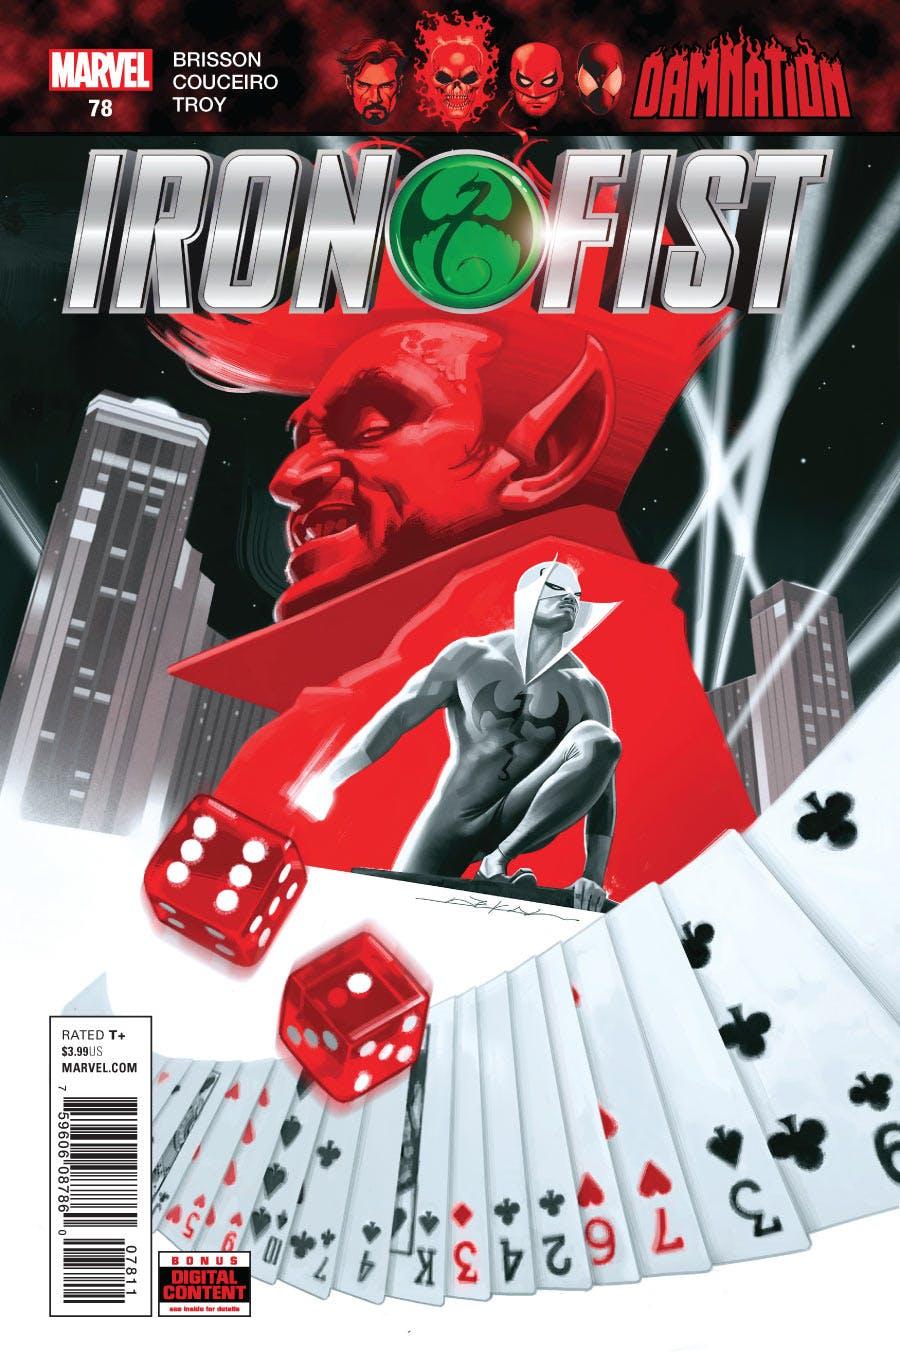 Iron Fist Vol 1 78